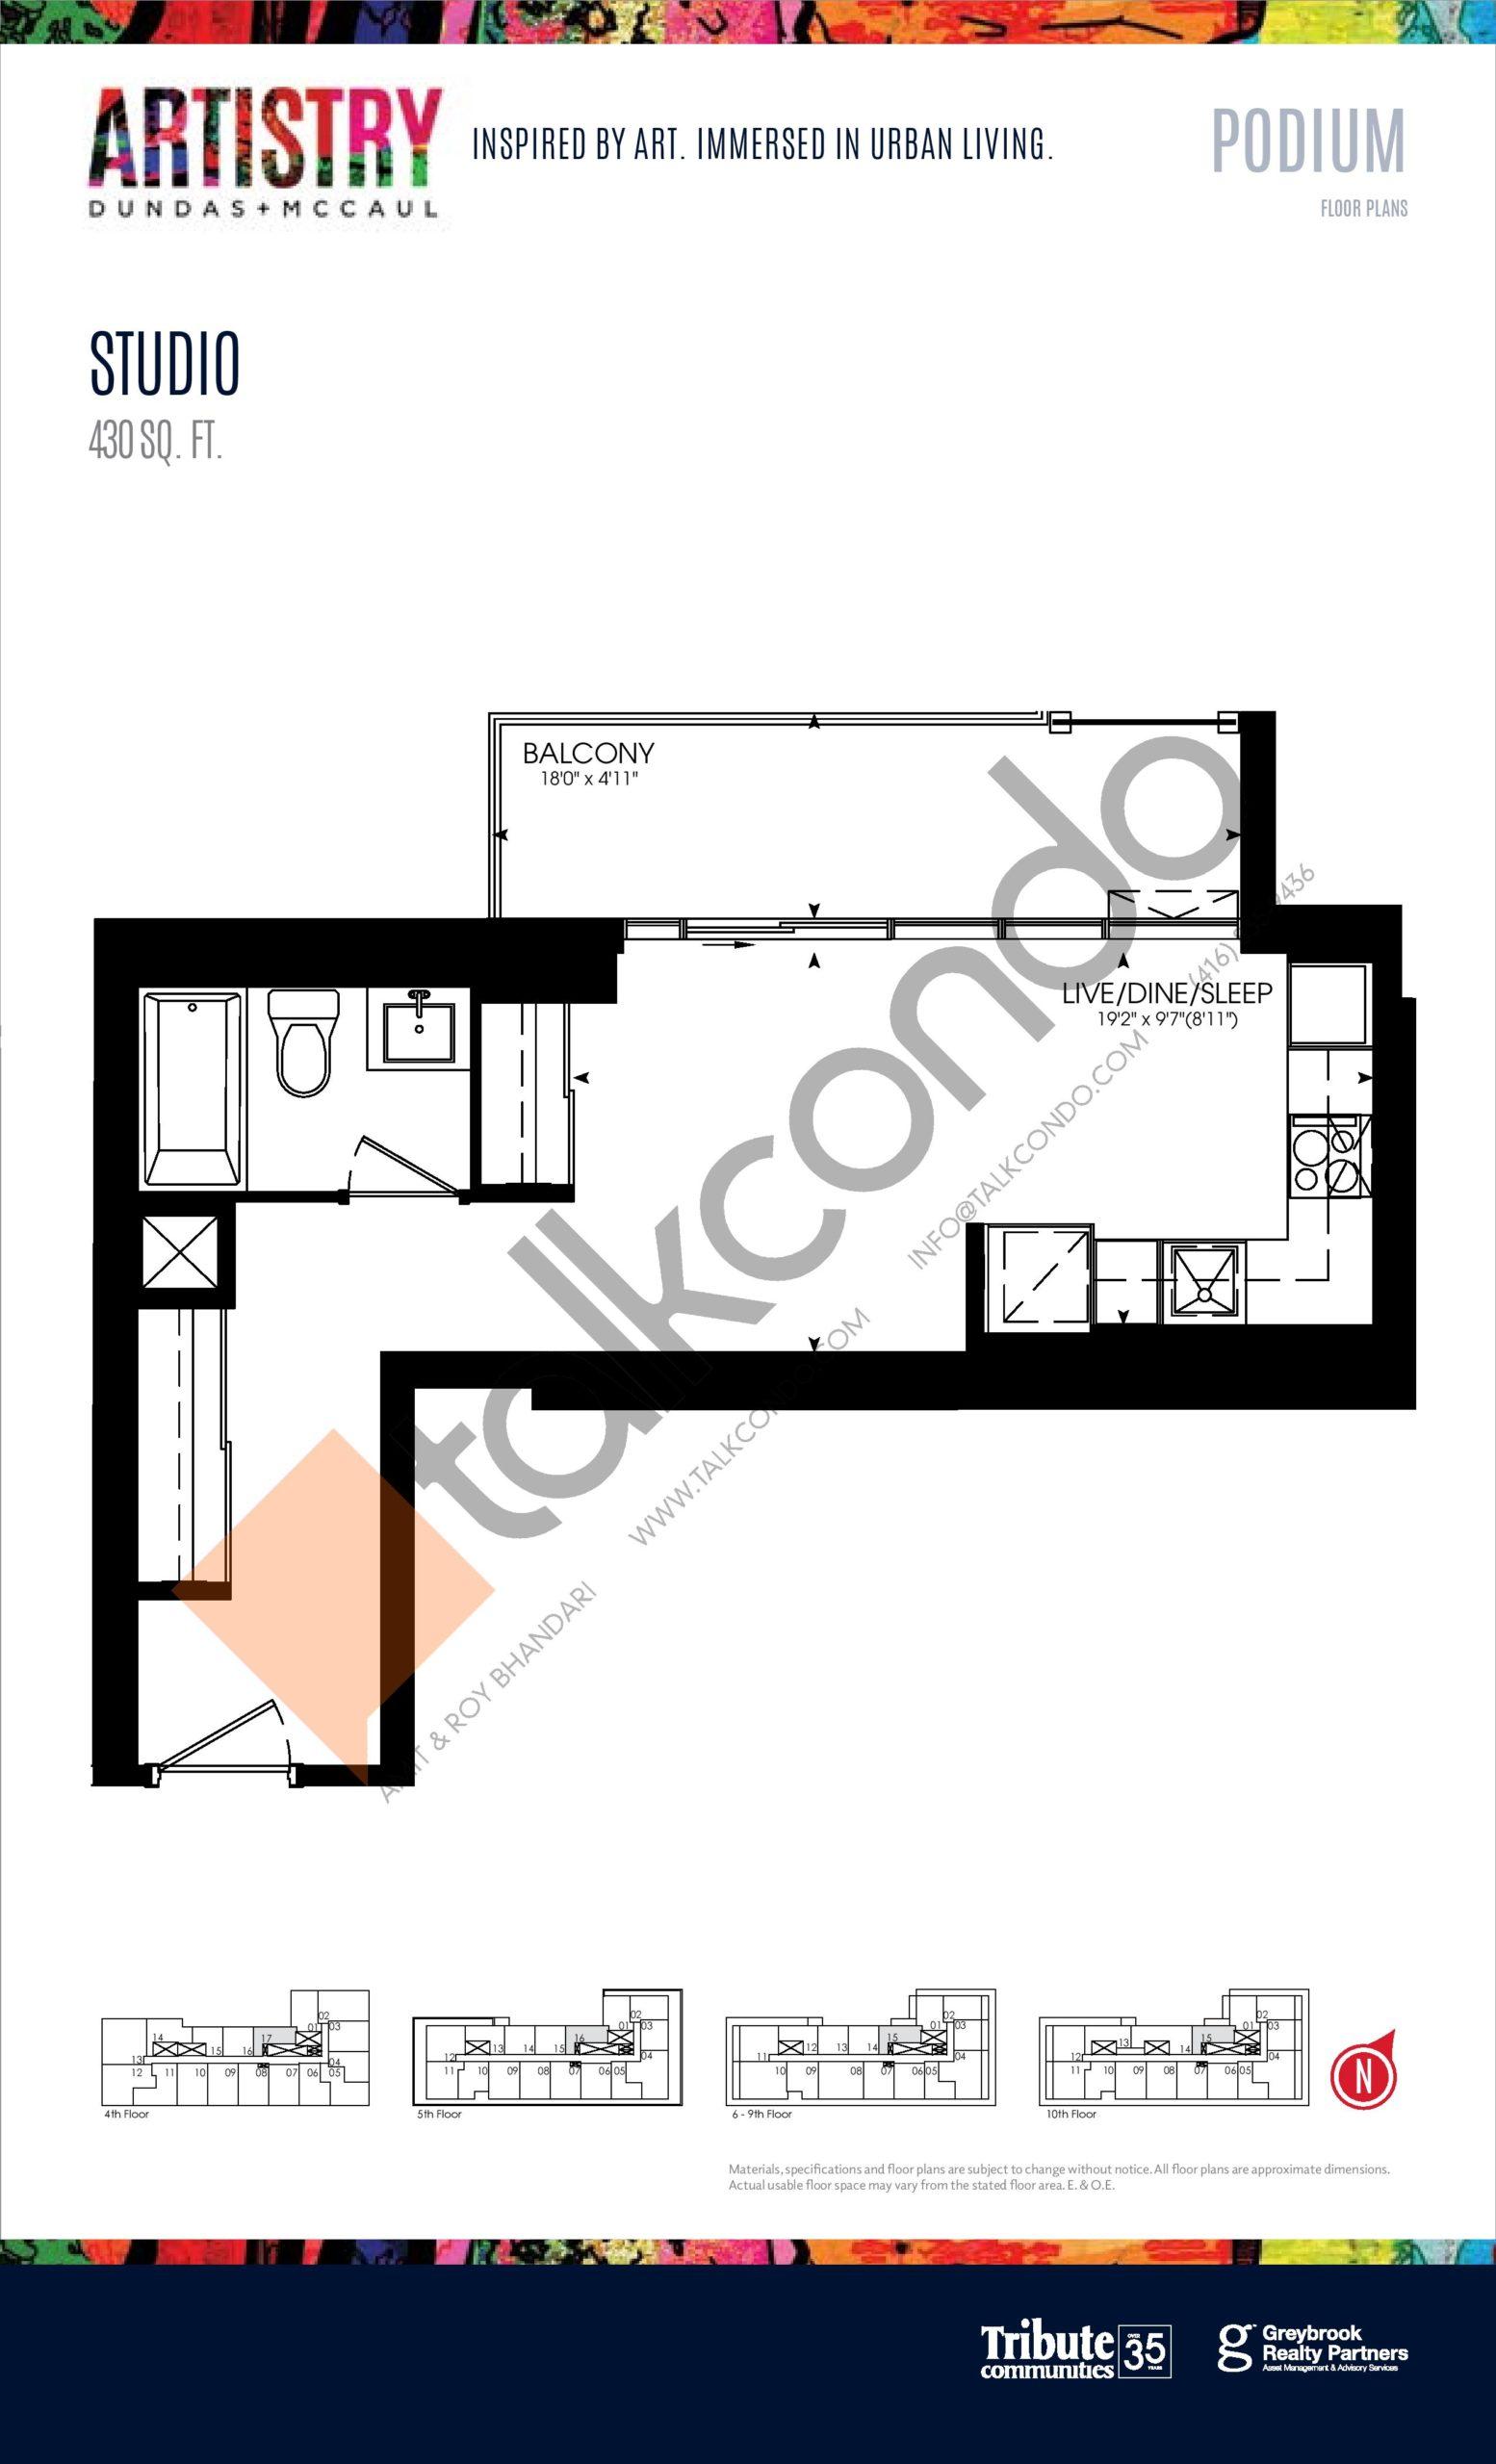 430 sq. ft. - Podium Floor Plan at Artistry Condos - 430 sq.ft